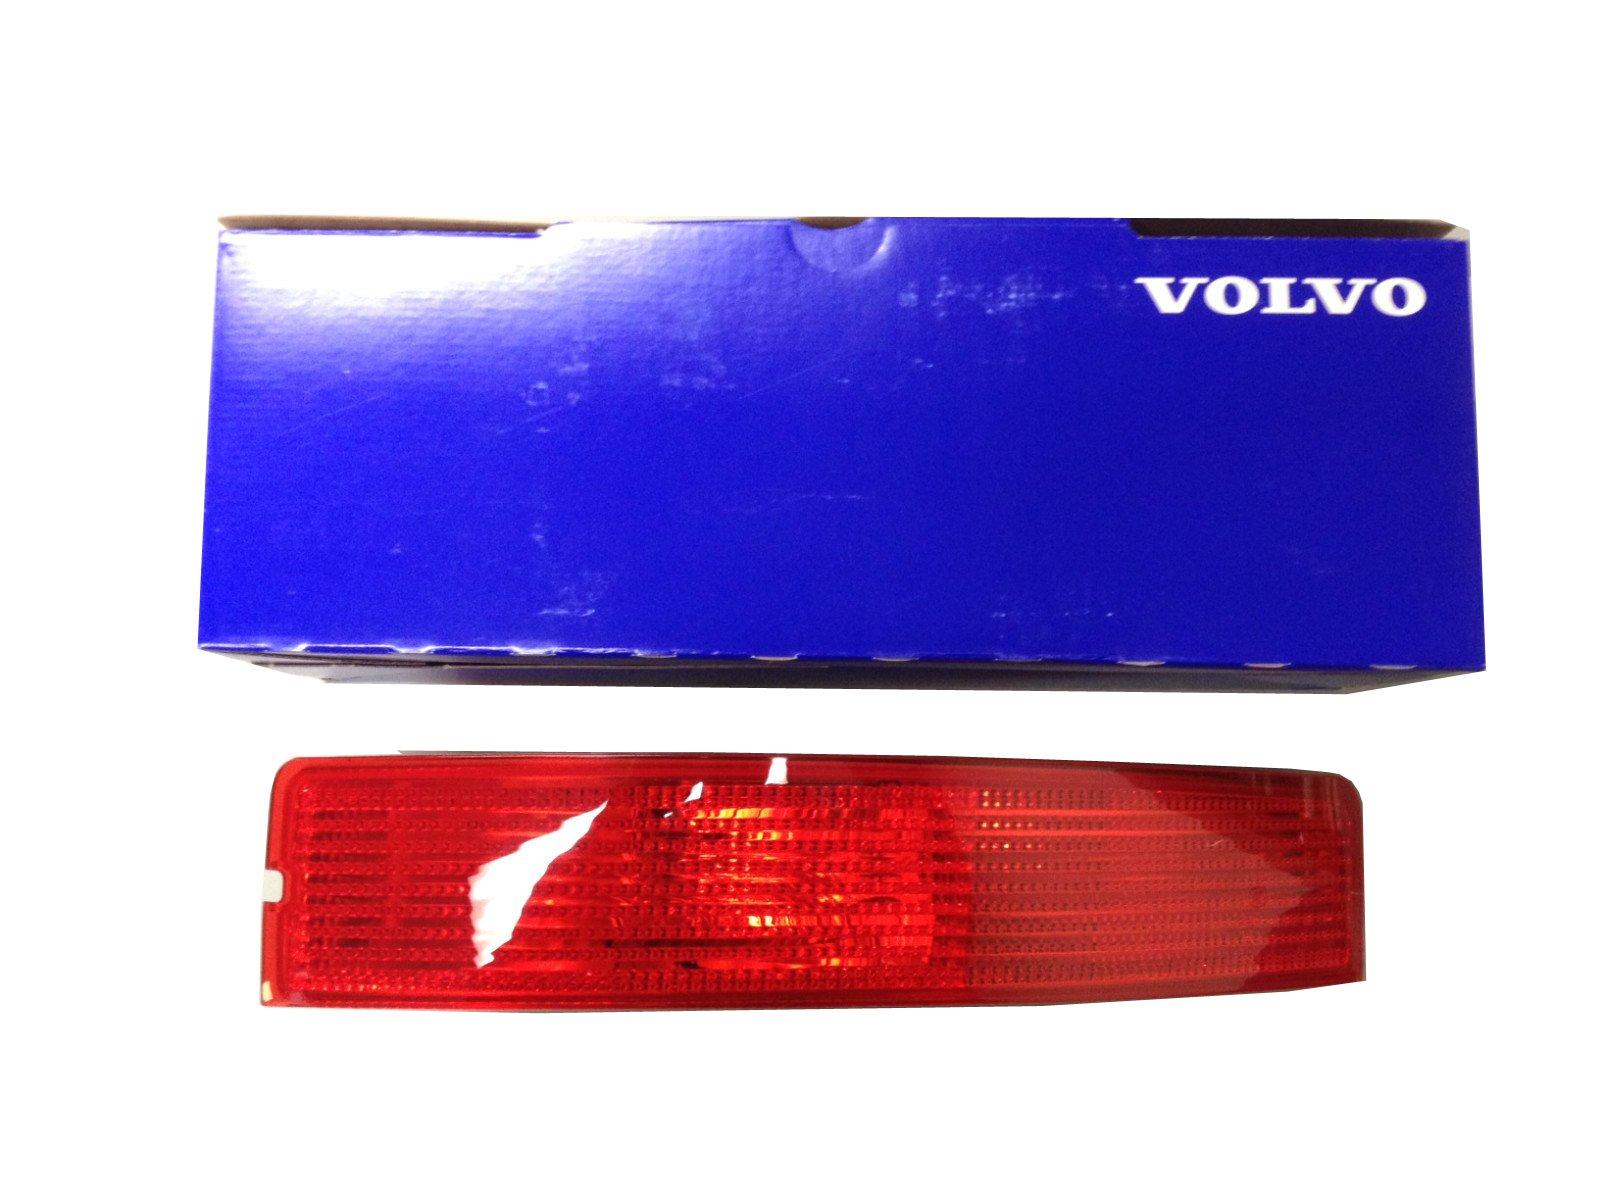 Genuine Volvo XC90 2007-2013 RH Rear Bumper Reflector Lens #31111185 NEW OEM